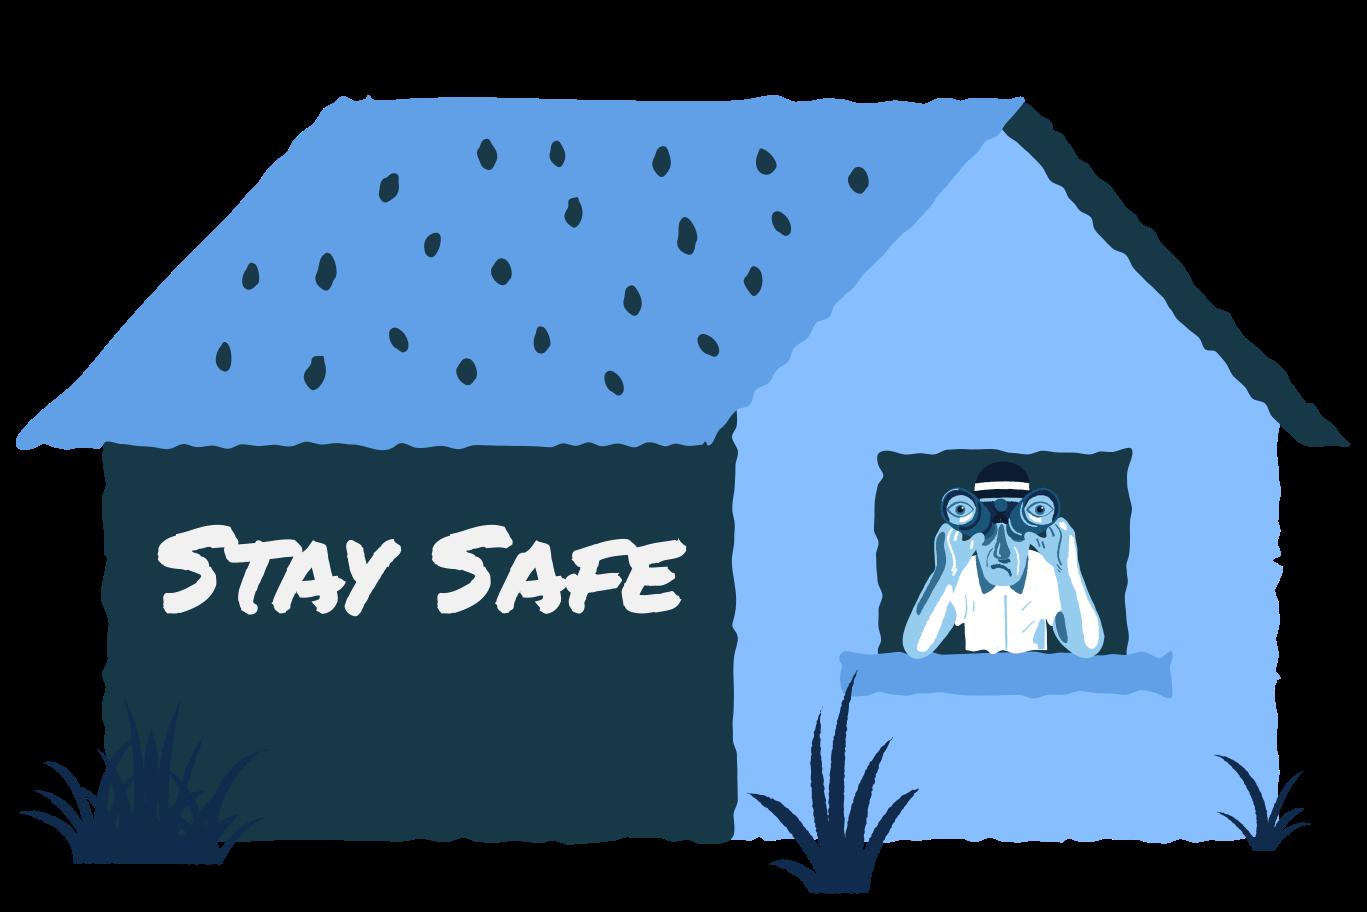 Stay Safe Clipart illustration in PNG, SVG